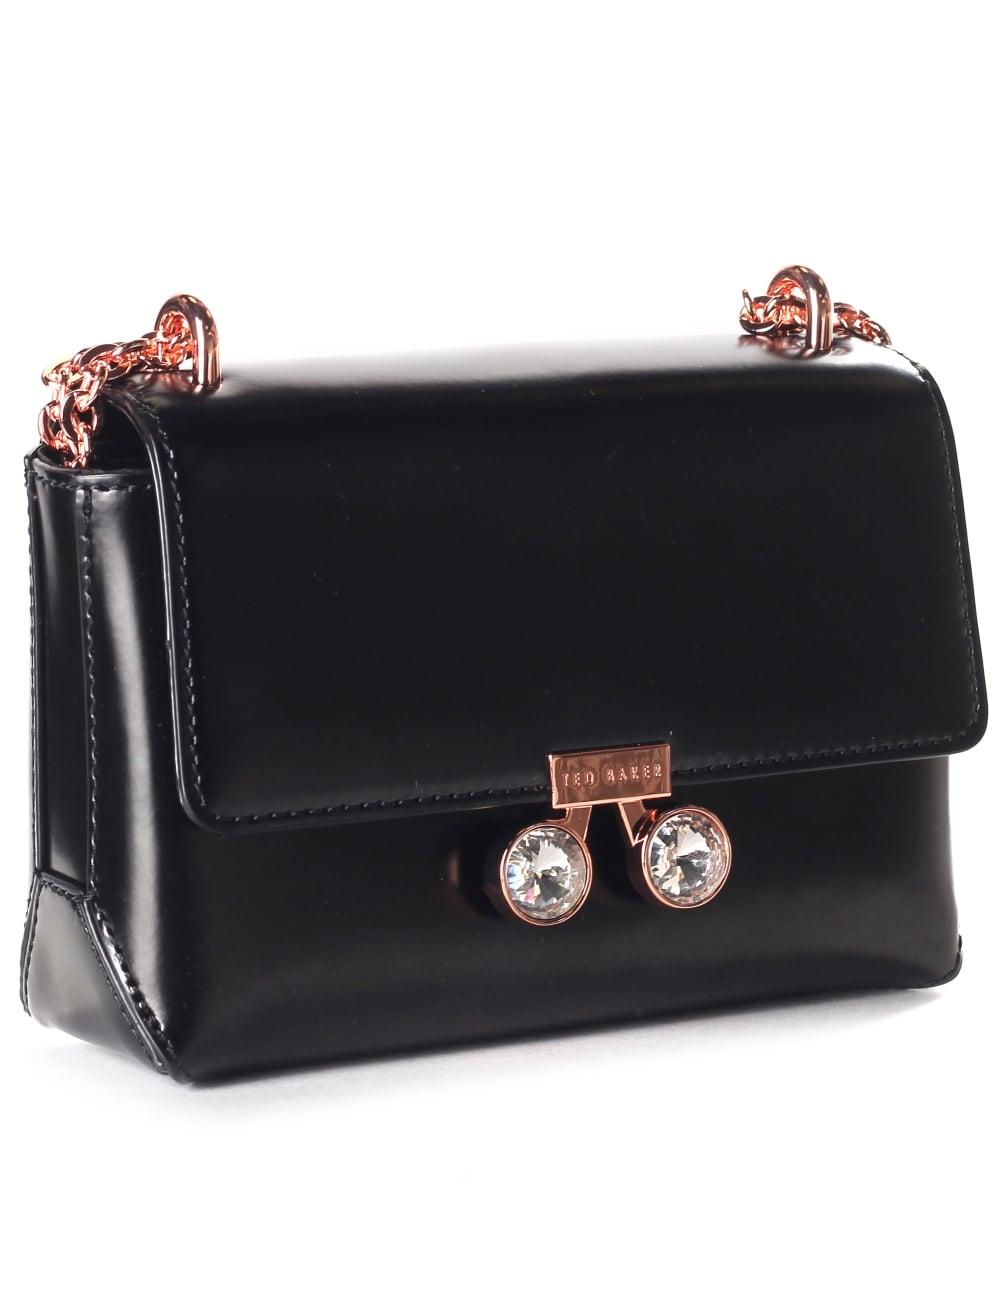 0741ddd13a7826 Ted Baker Adoni Crystal Lock Women s Mini Crossbody Bag Black